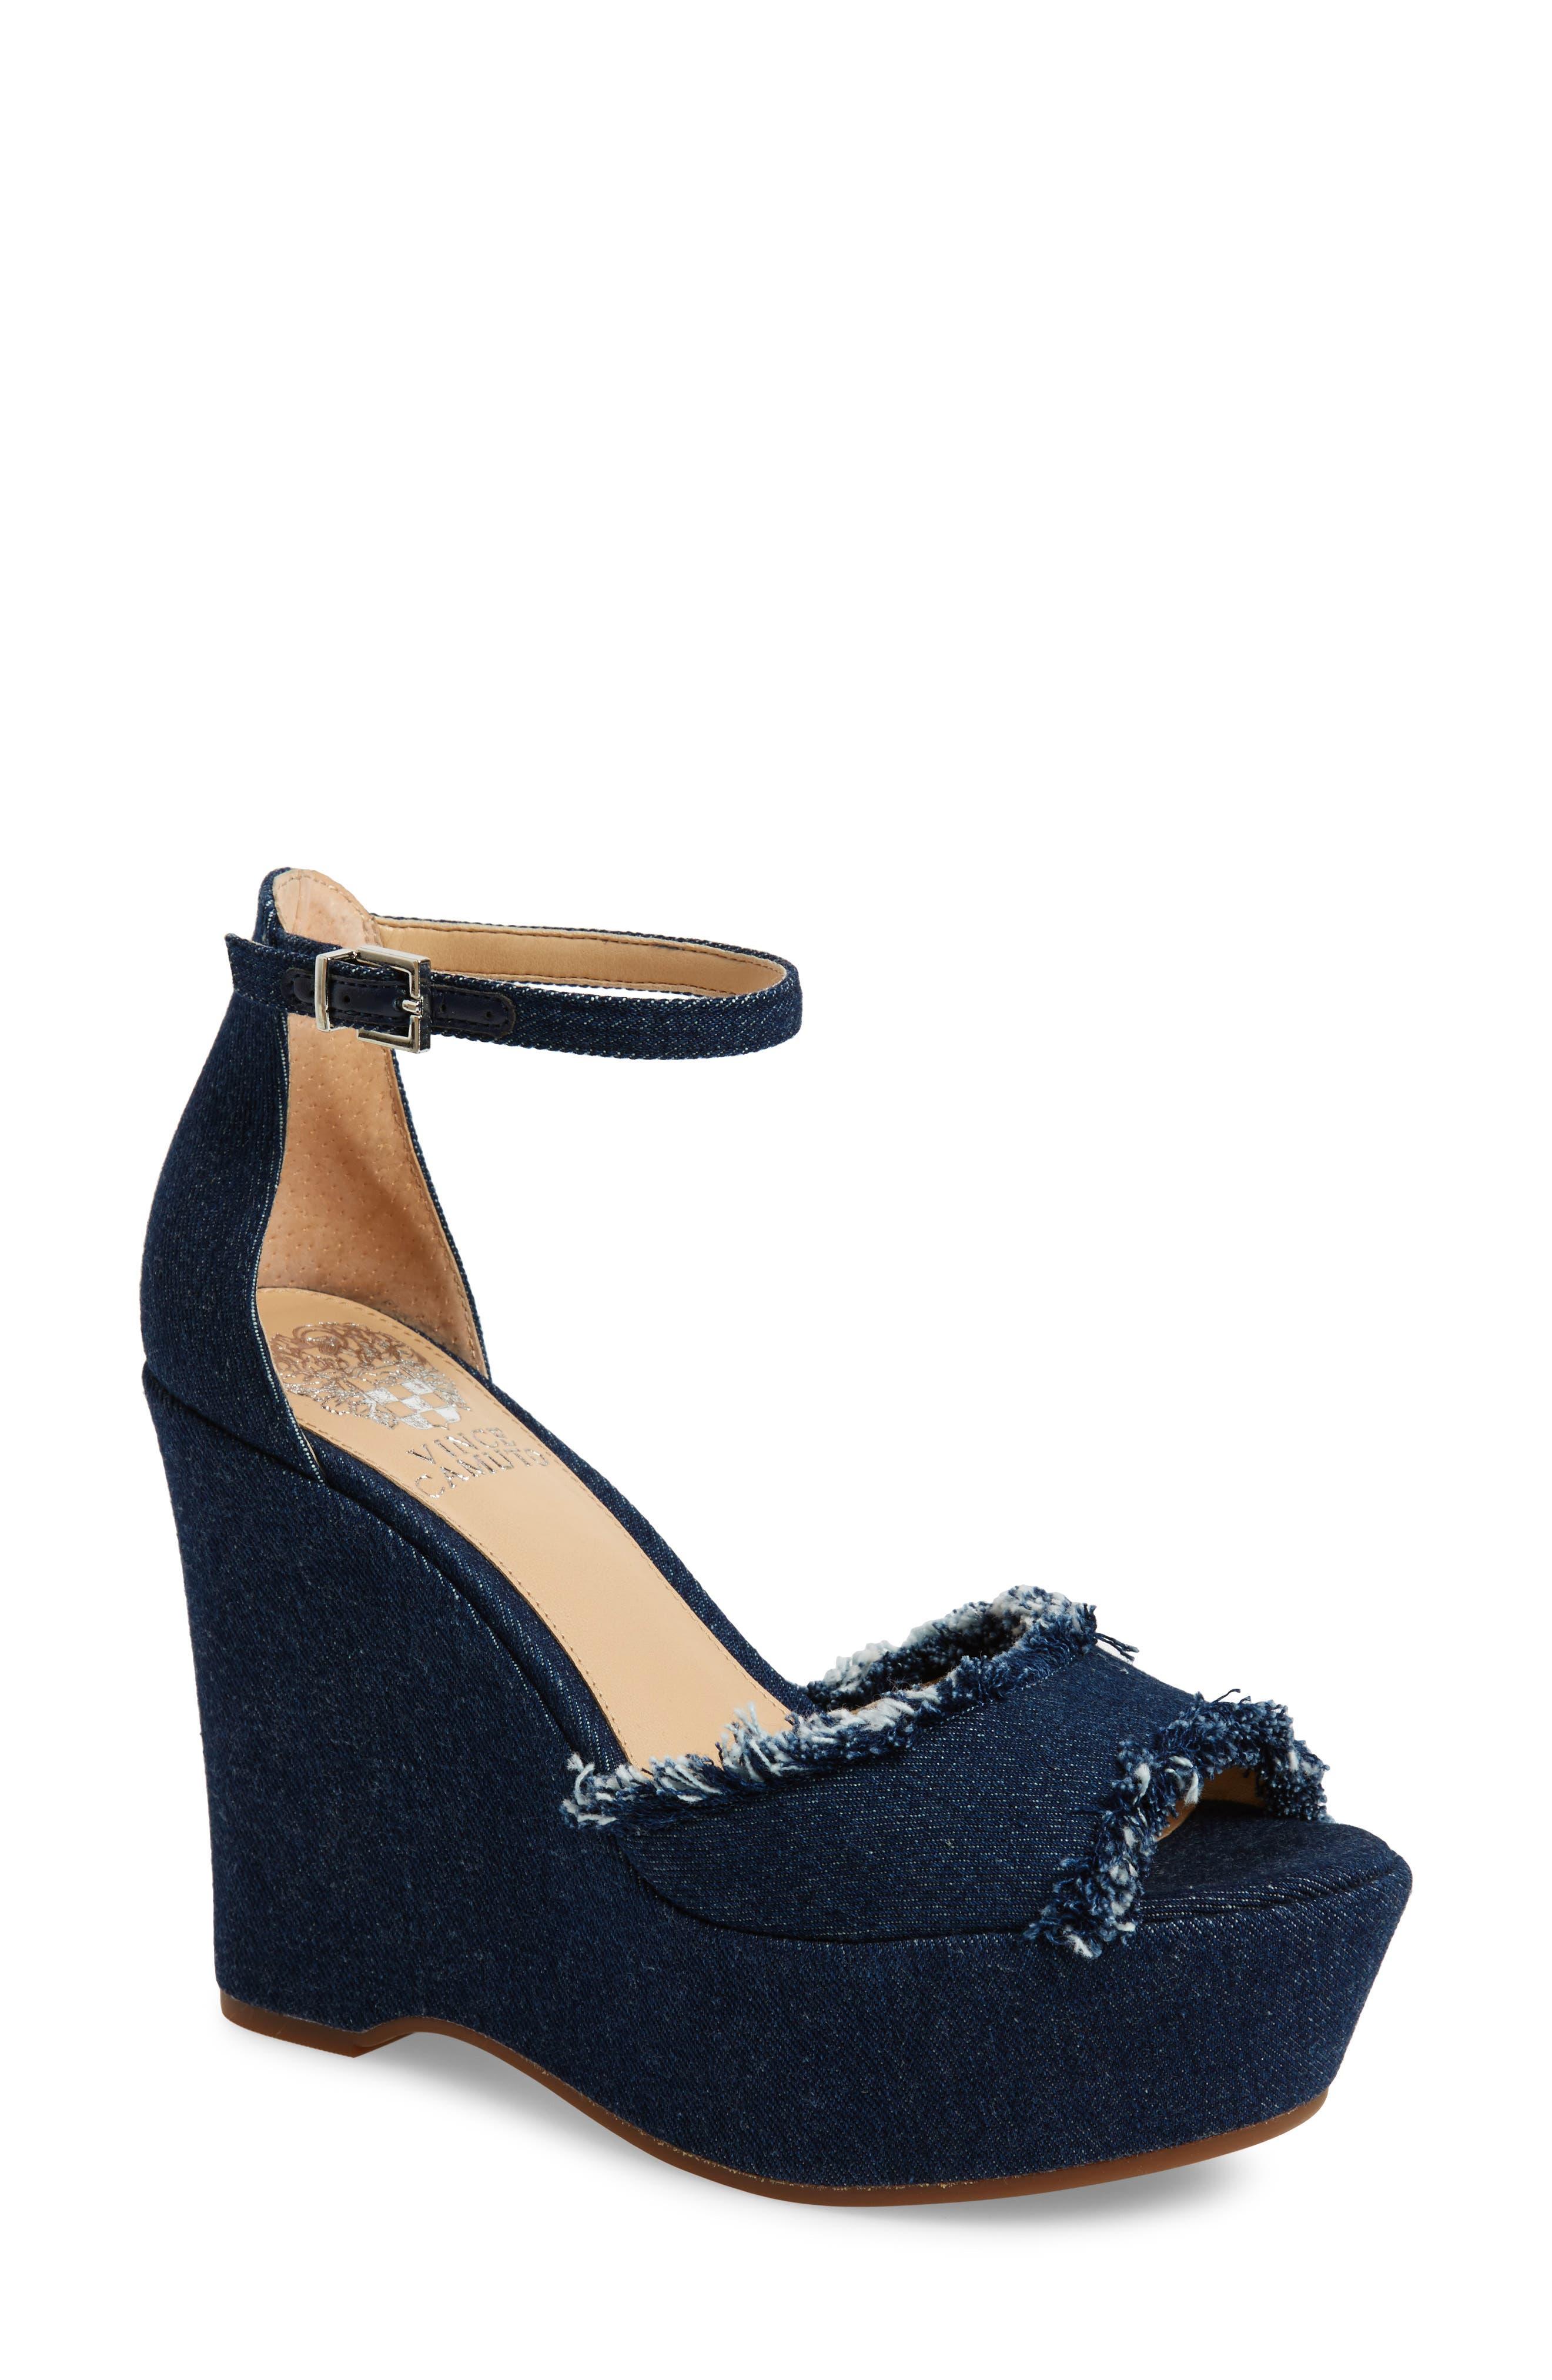 Tatchen Ankle Strap Platform Sandal,                             Main thumbnail 1, color,                             Dark Blue Denim